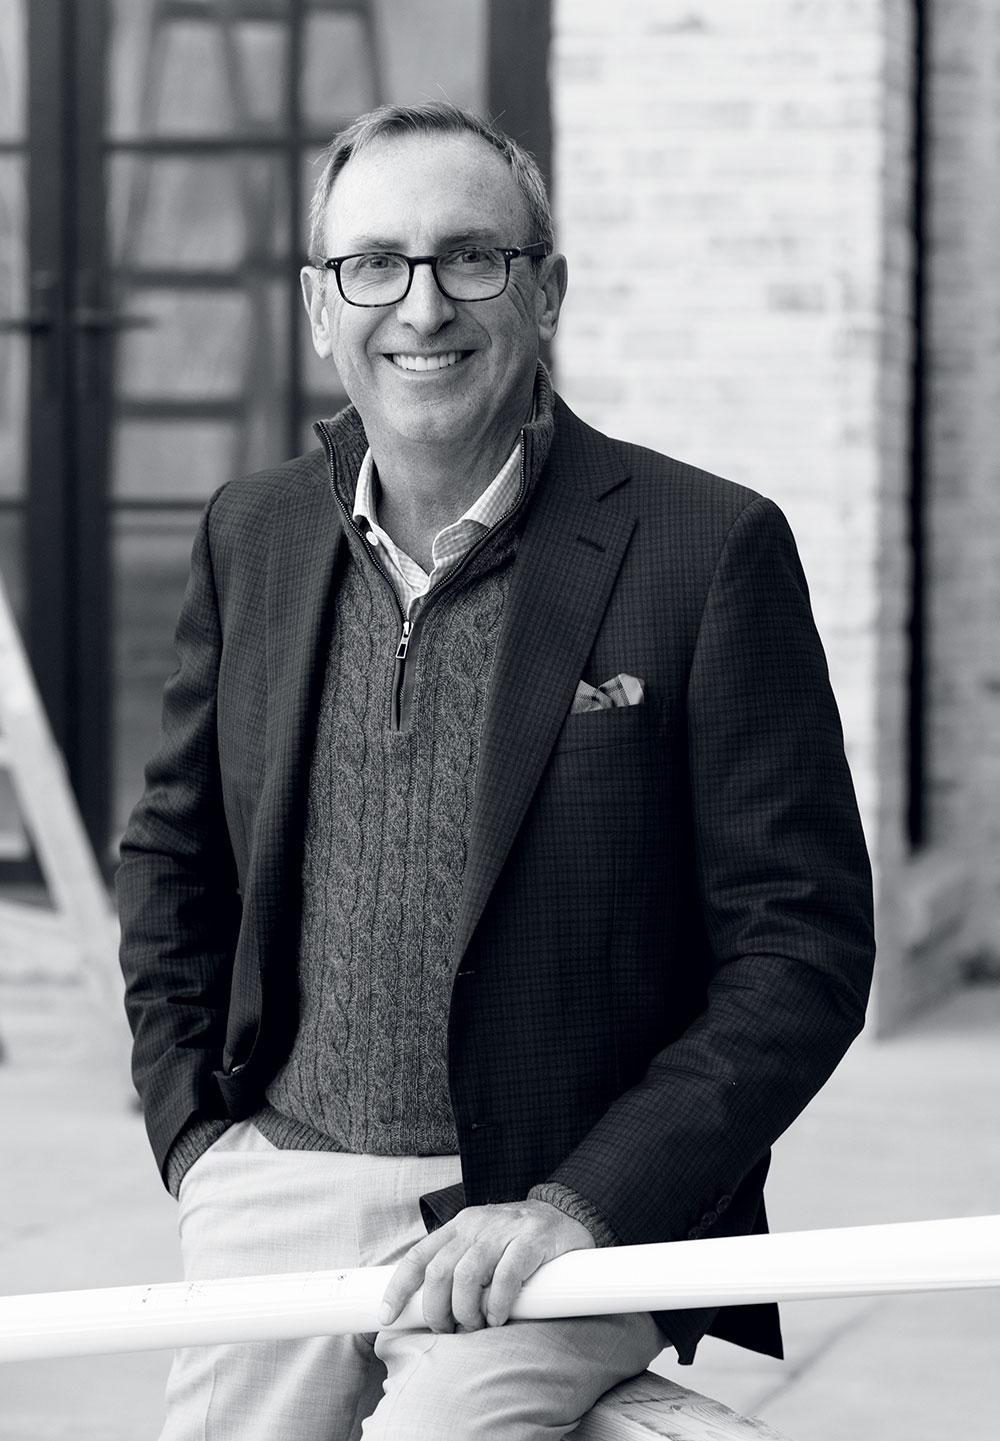 Joy Design + Build - Industry Leader in Building Dream Homes